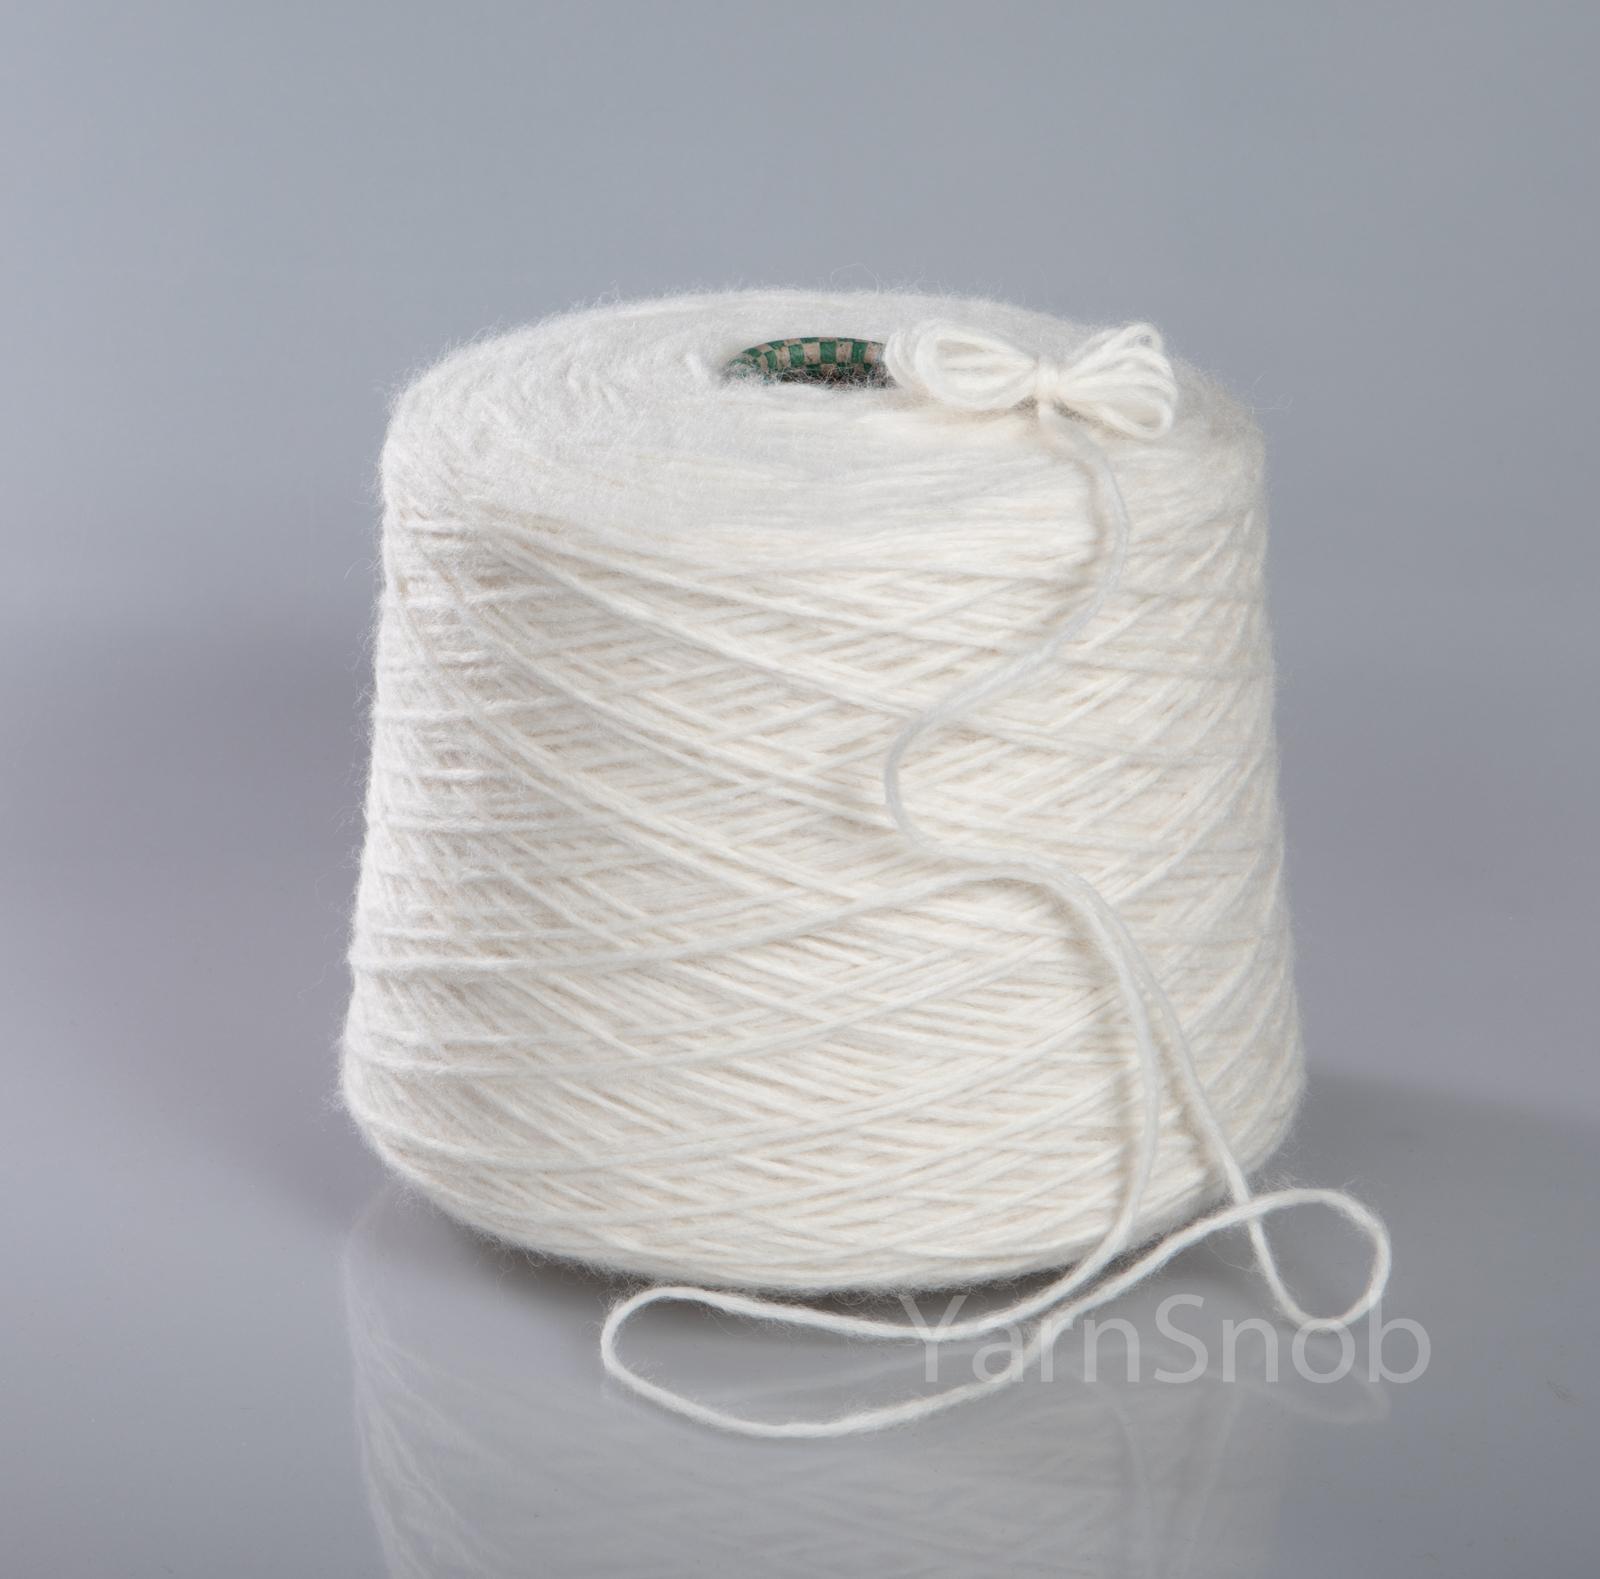 19018-SummerYak, натурально-белый